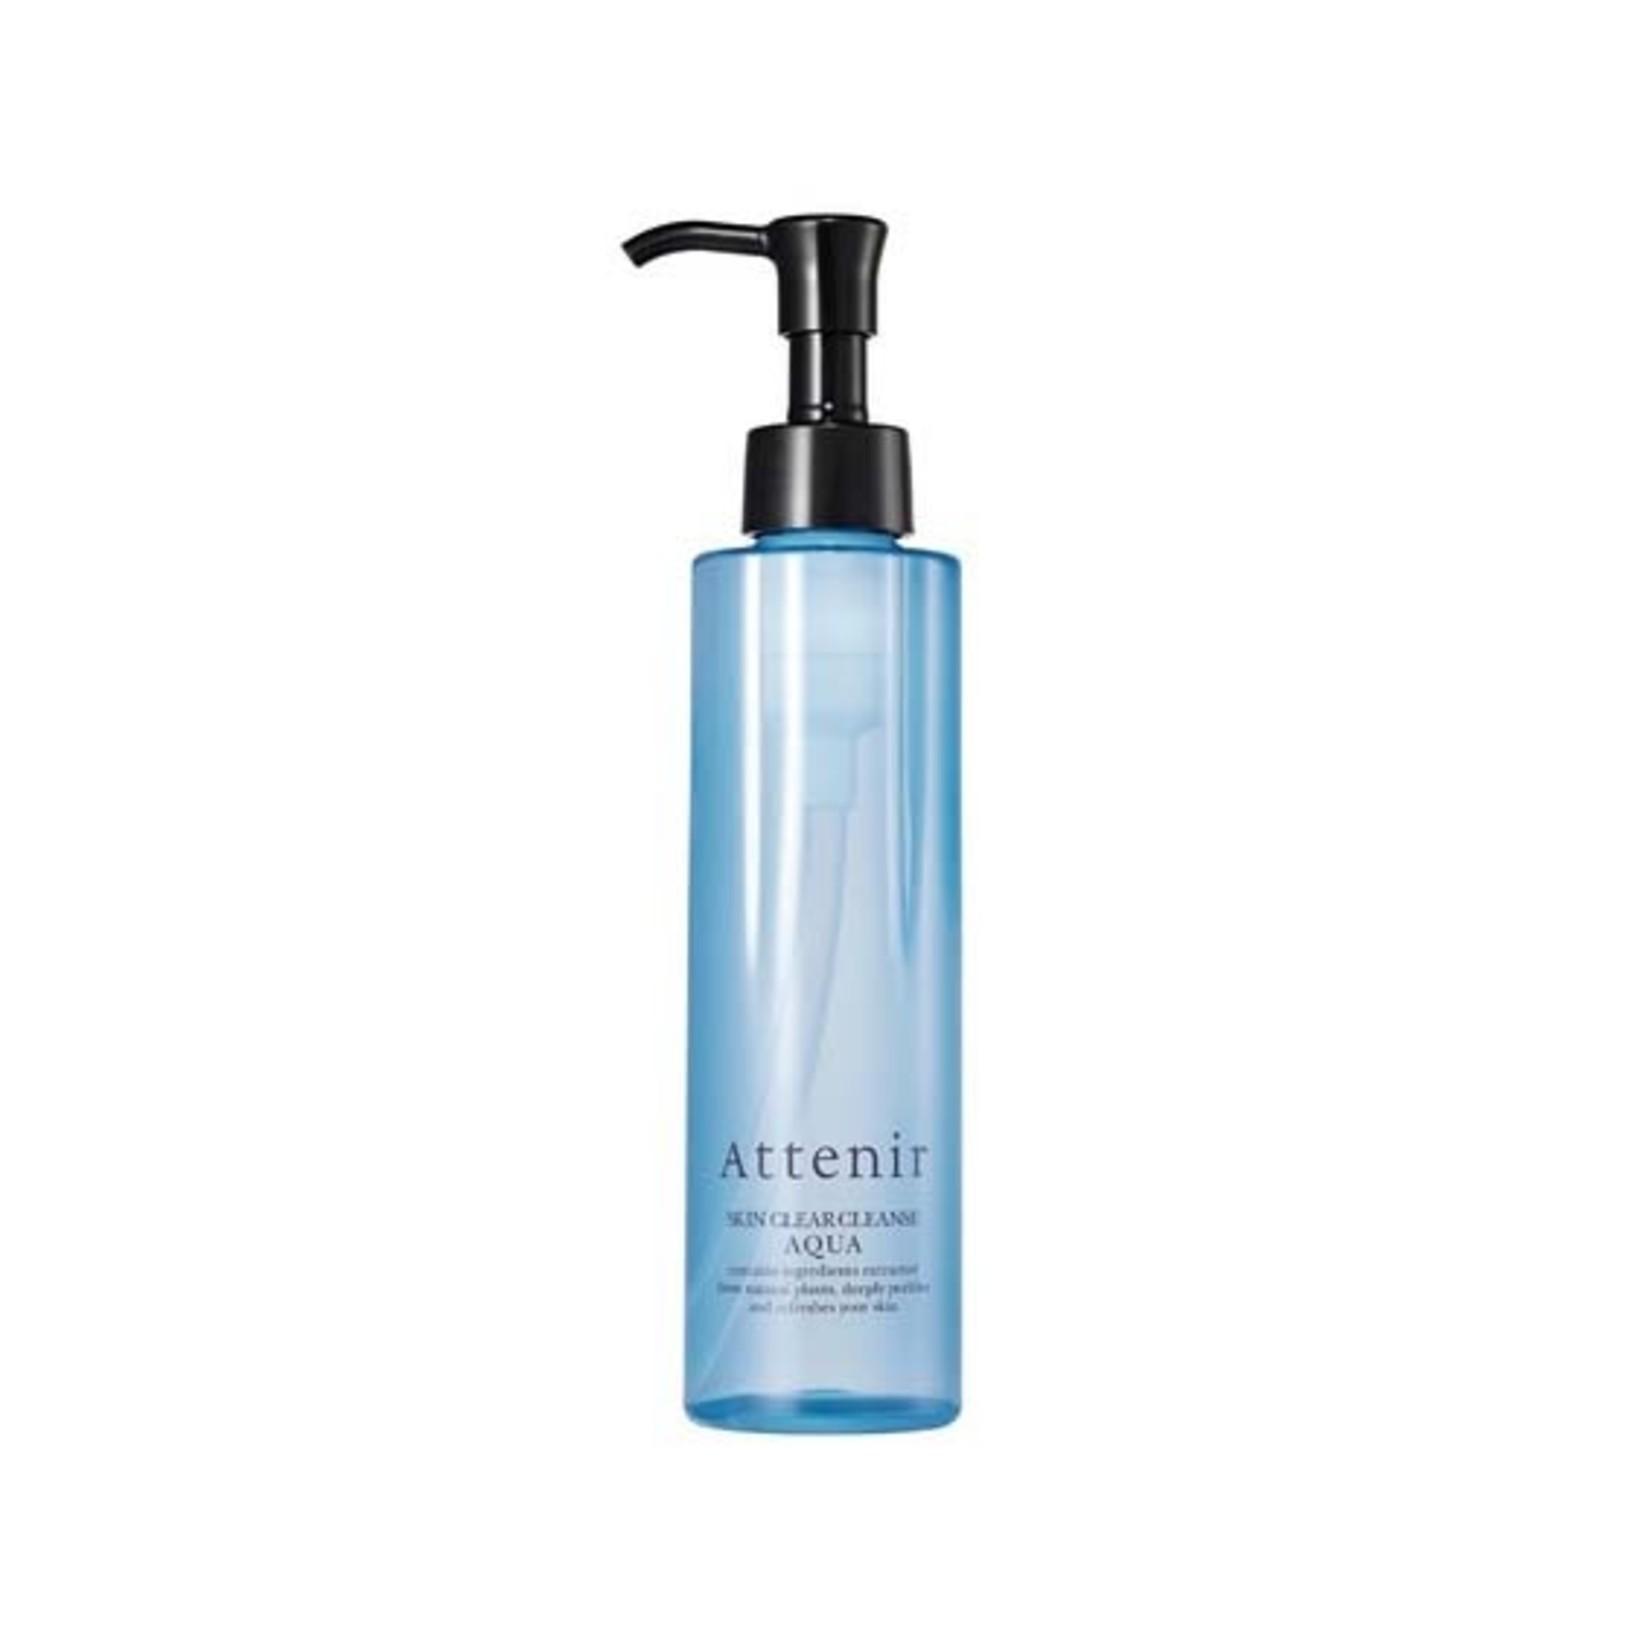 Attenir Attenir Skin Clear Cleanse Oil W/ Fresh Citrus Fragrance